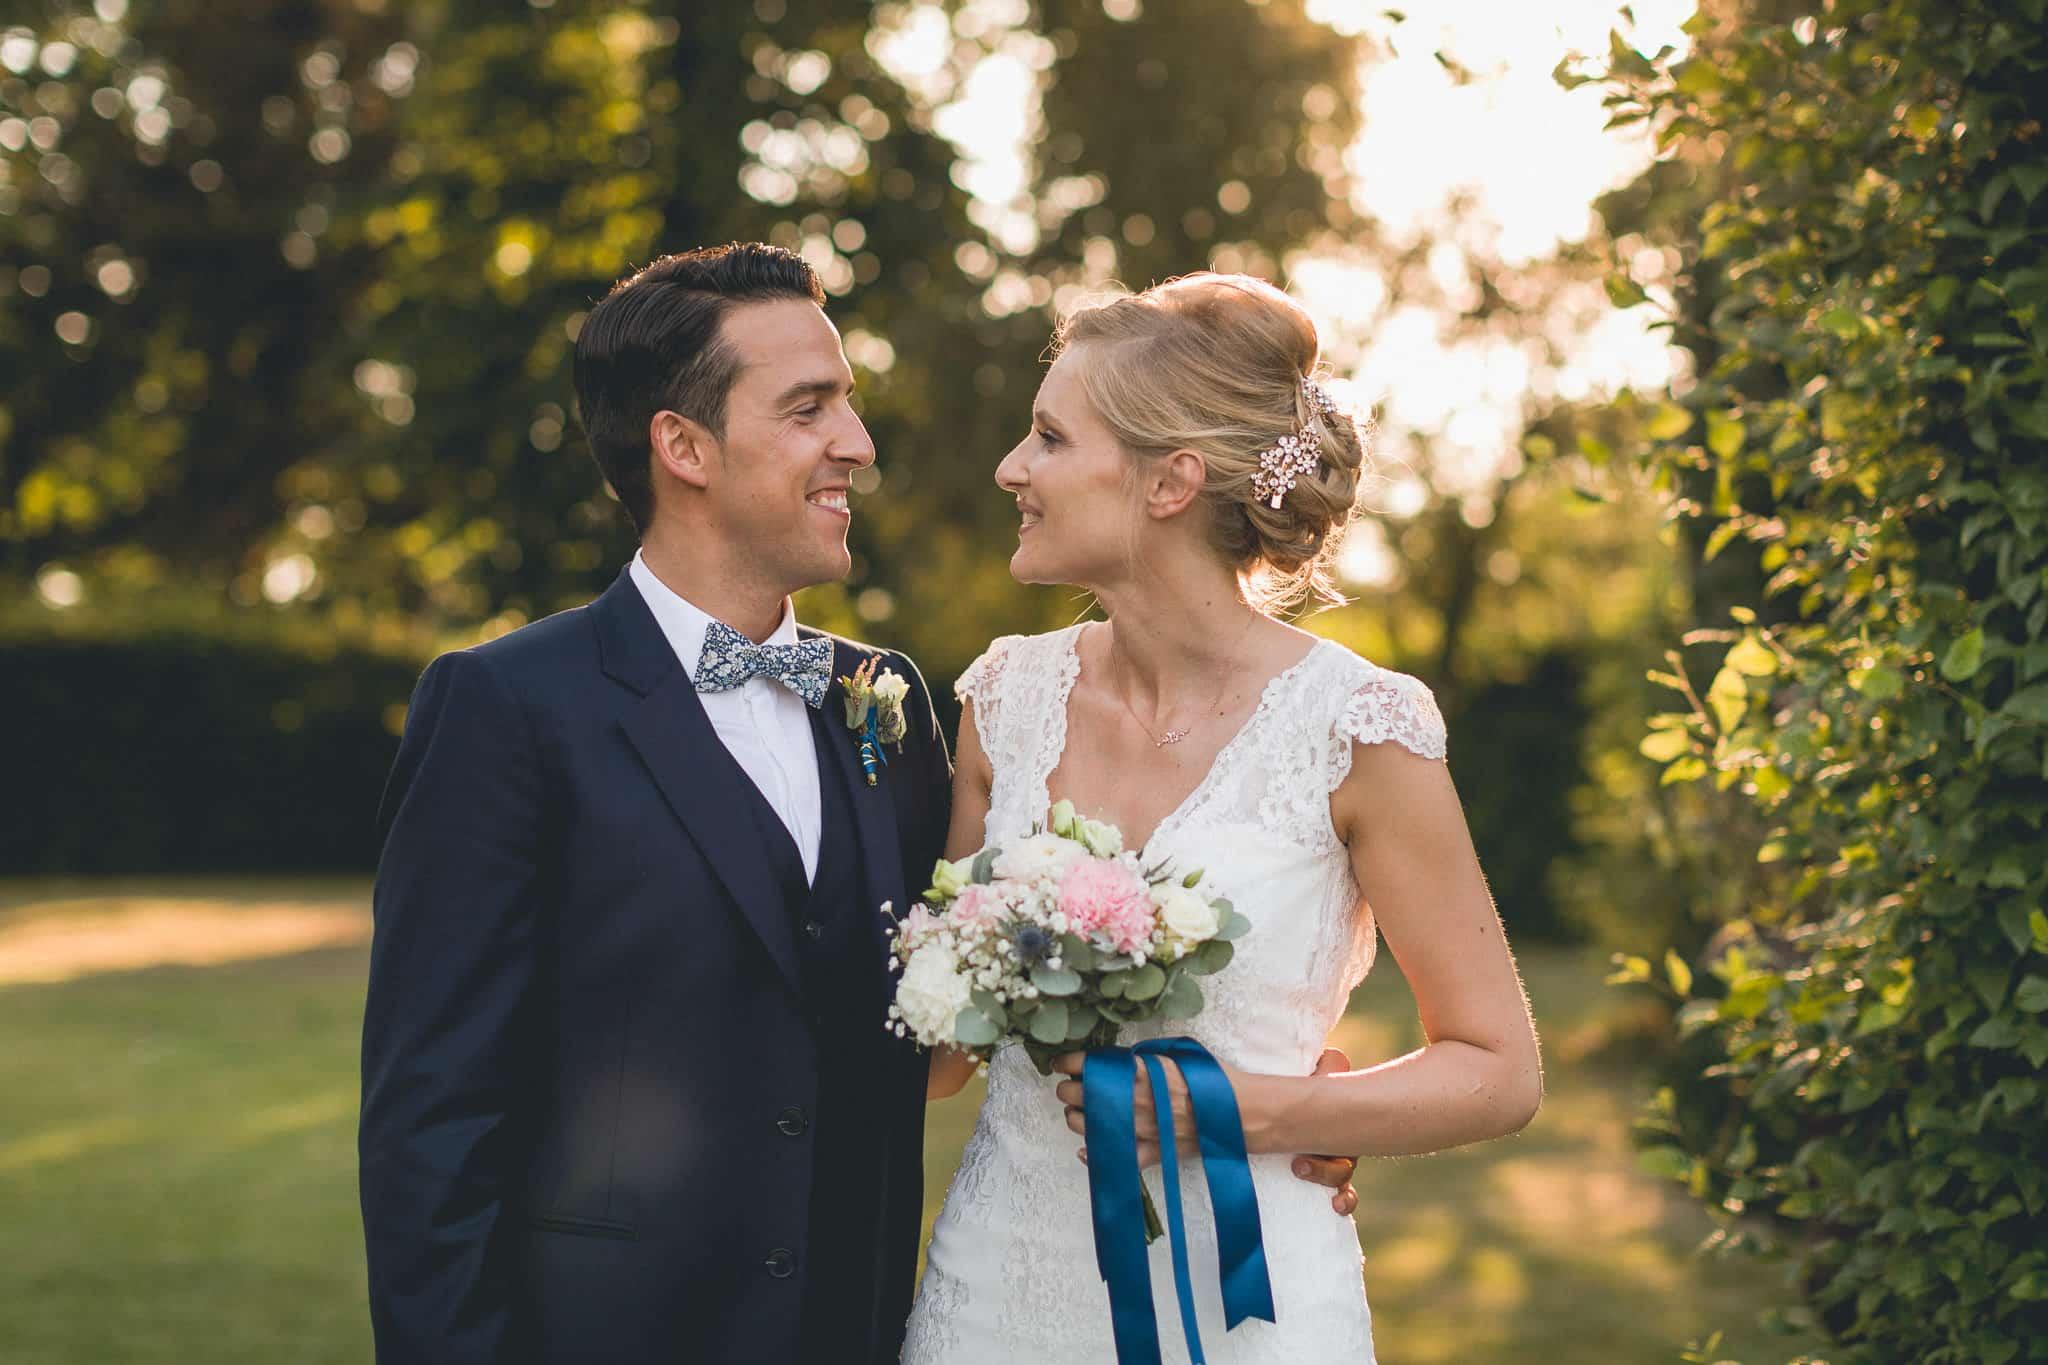 photographe mariage lille nord tourcoing alta ripa rippa